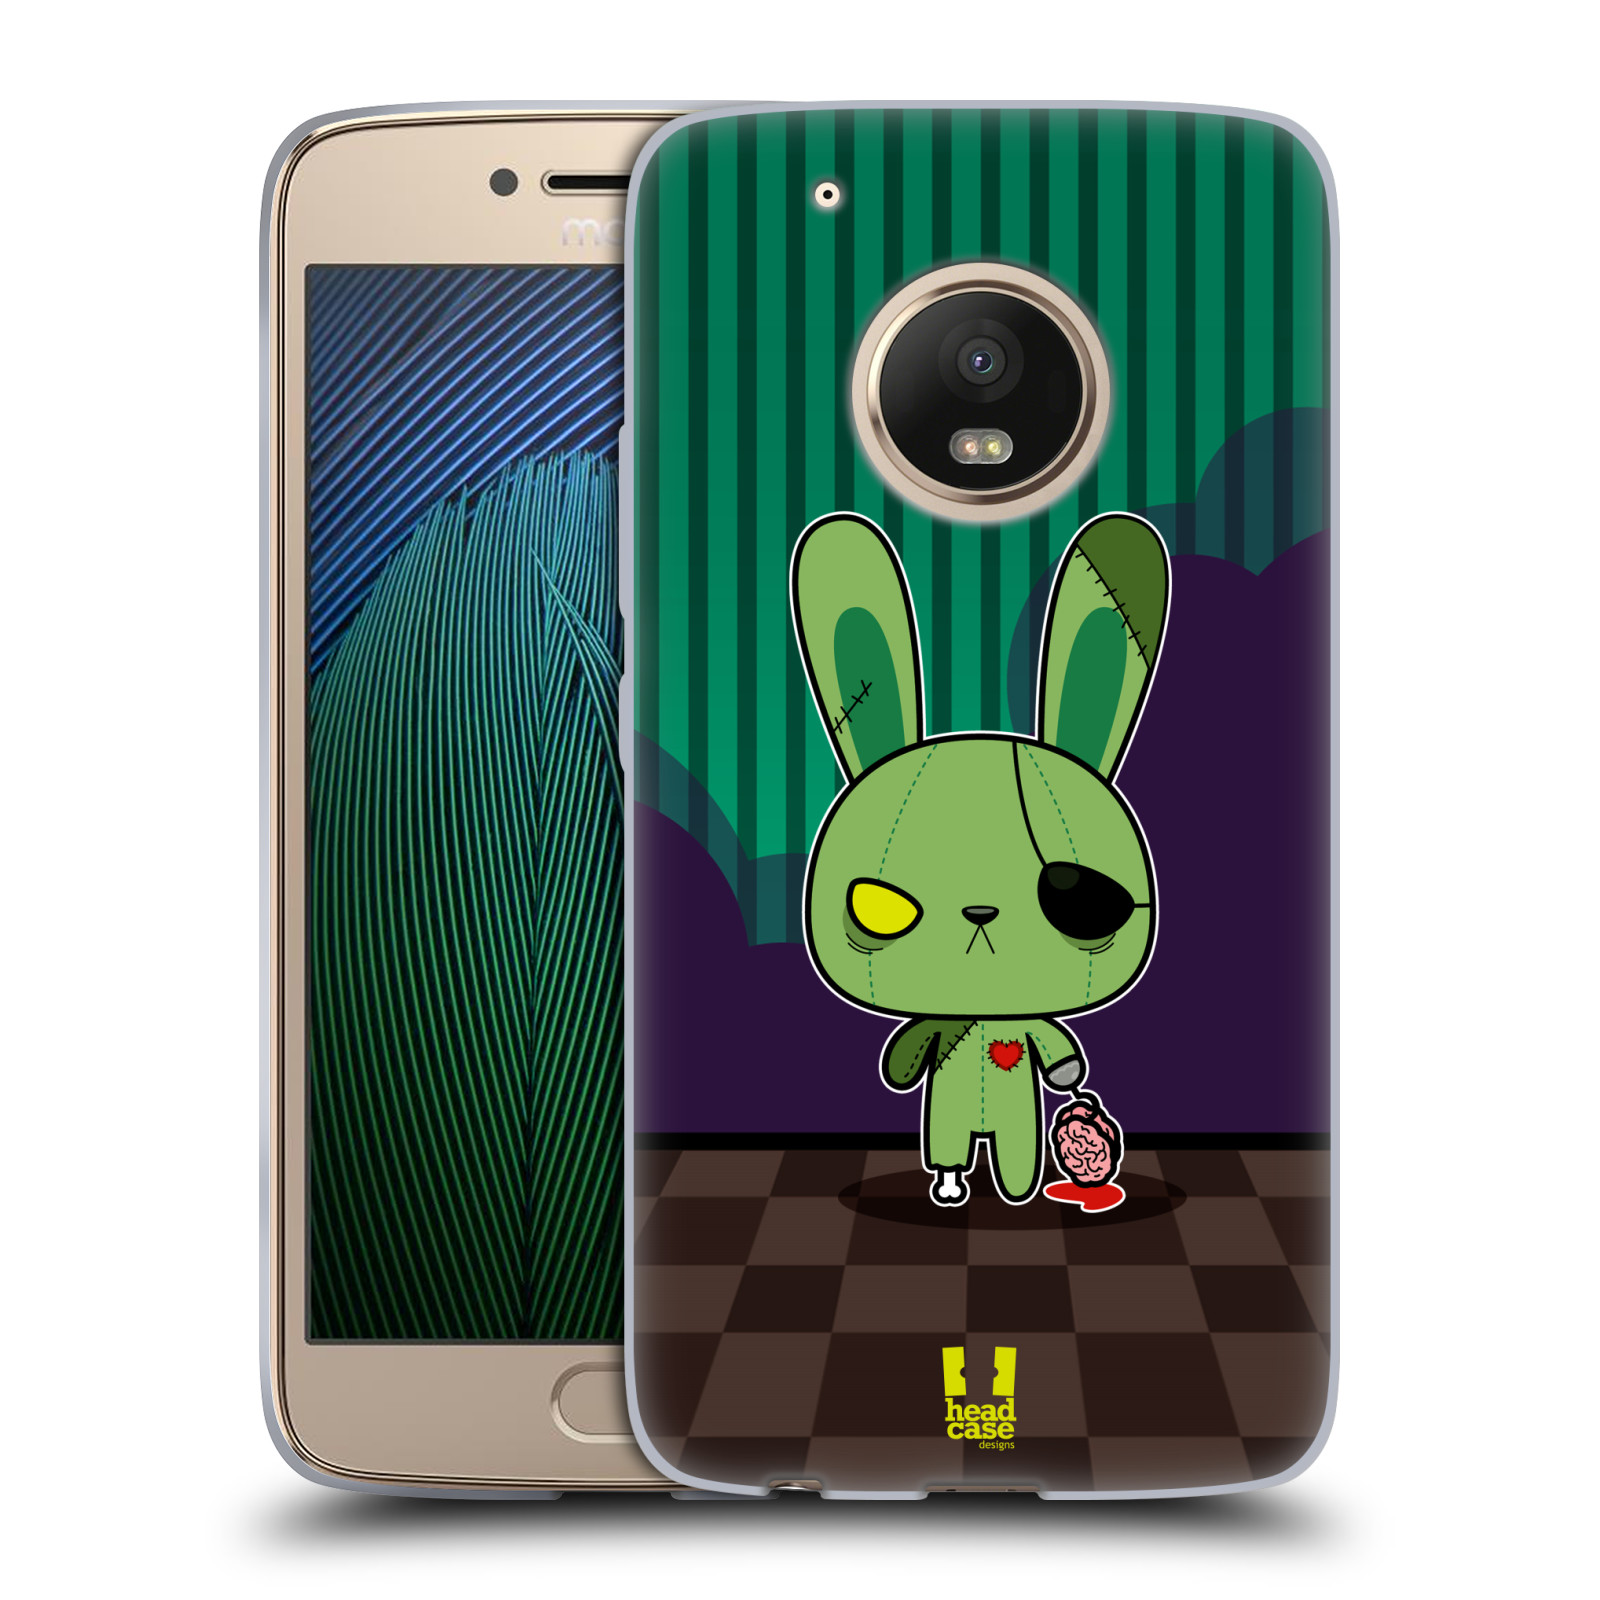 Silikonové pouzdro na mobil Lenovo Moto G5 Plus - Head Case ZOMBIE KRÁLÍČEK